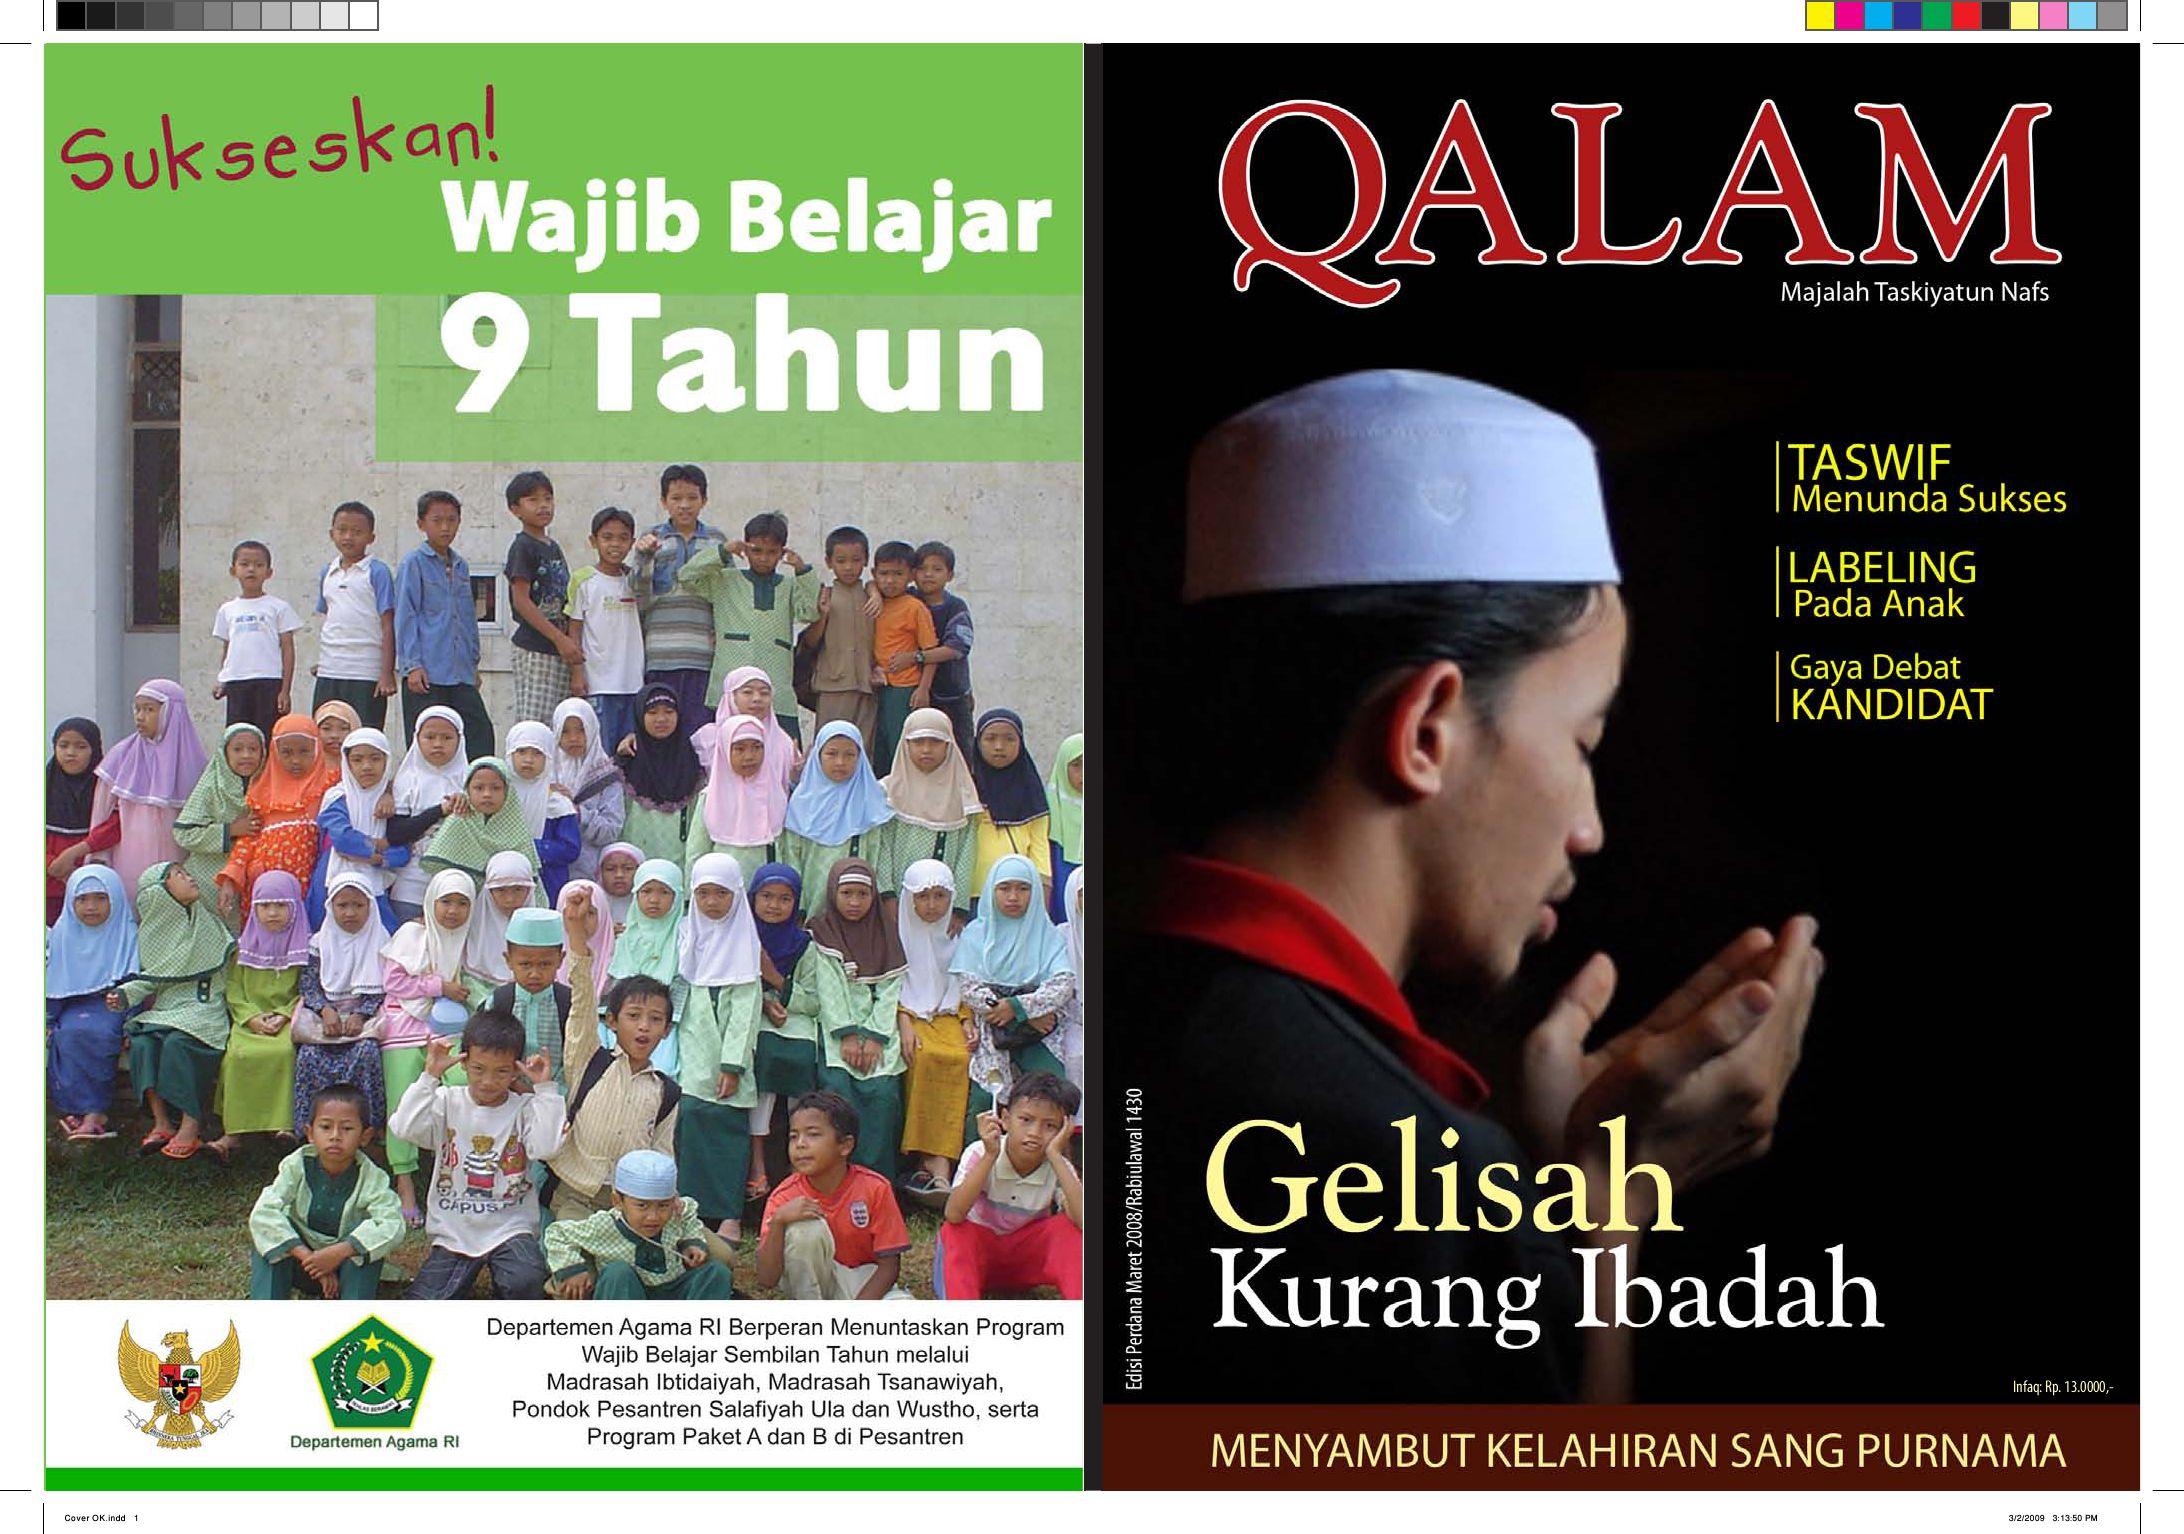 QALAM PERDANA 2009 By Ali Ibnuanwar Issuu